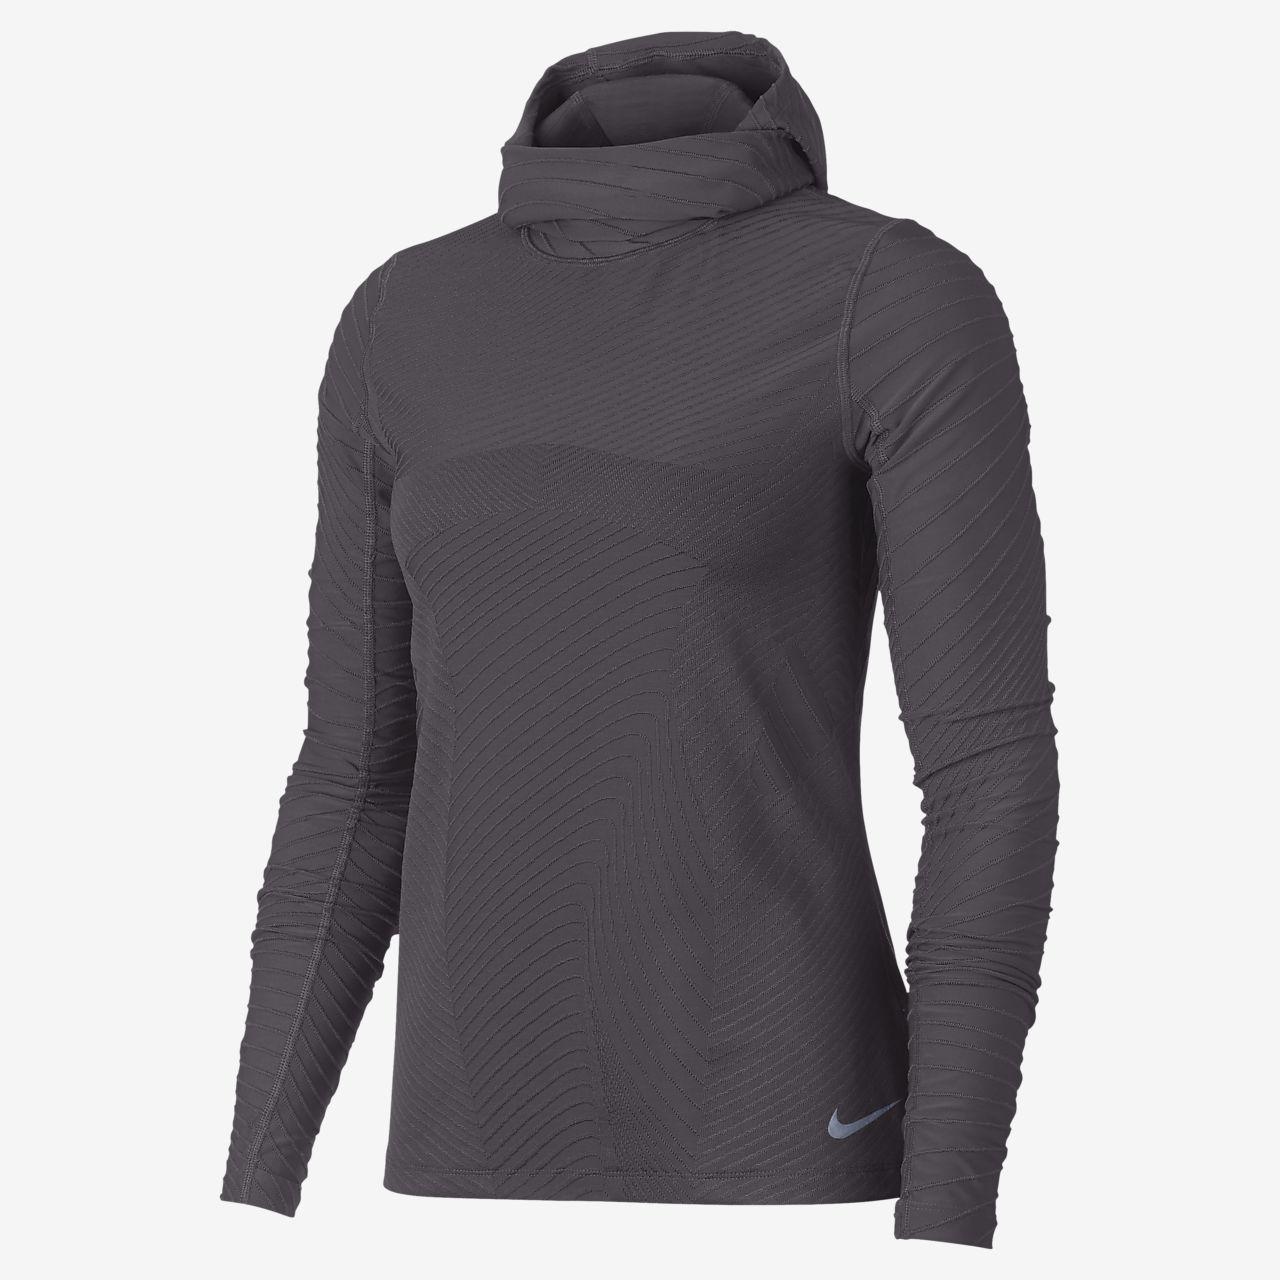 sale retailer 59ff6 92d75 Sudadera con capucha de running para mujer Nike Element